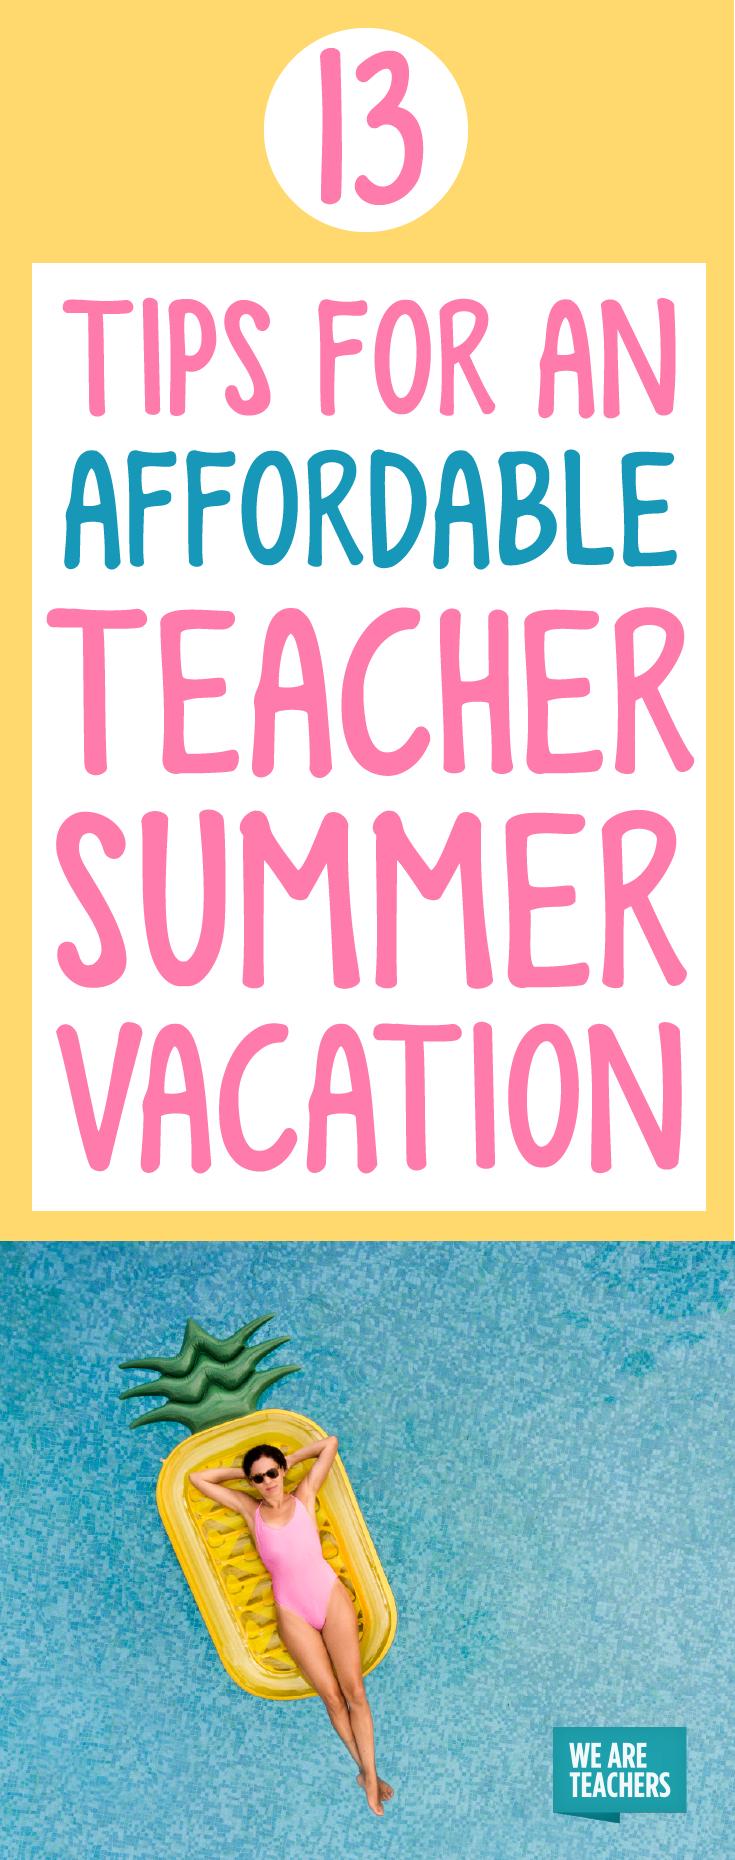 13 Tips for an Affordable Teacher Summer Vacation | Teacher